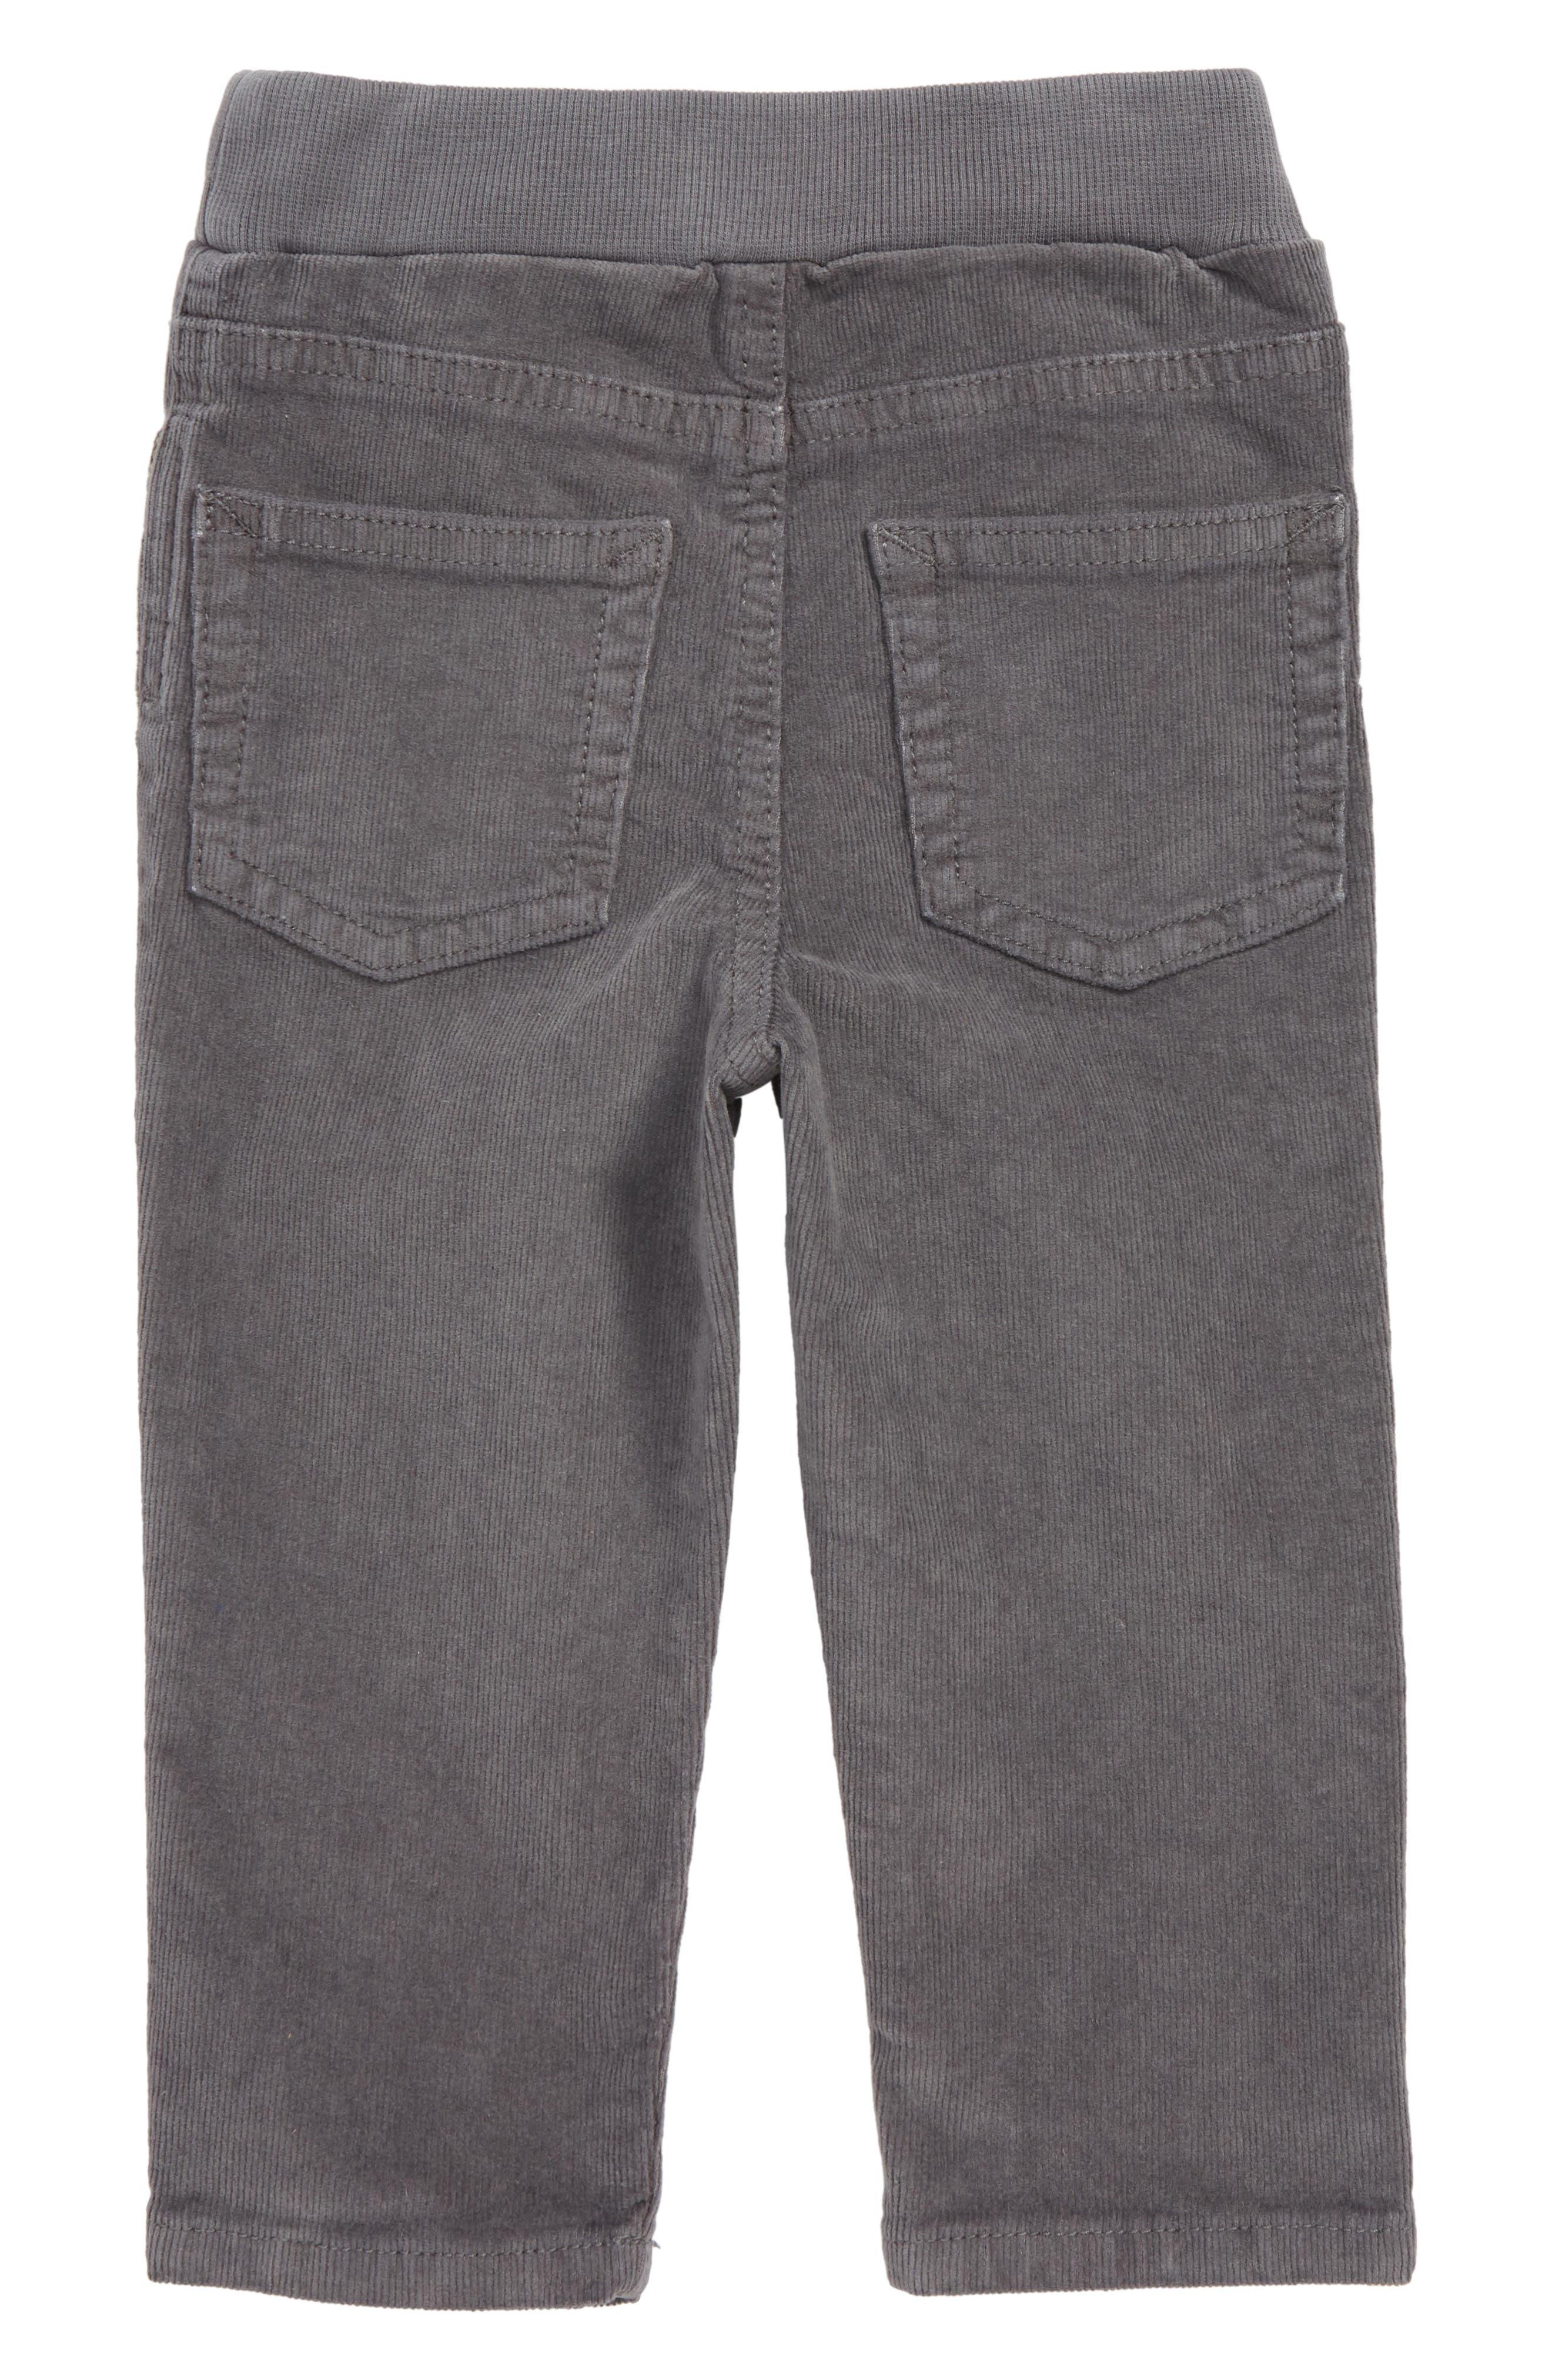 TUCKER + TATE,                             Corduroy Pants,                             Alternate thumbnail 2, color,                             GREY CASTLEROCK